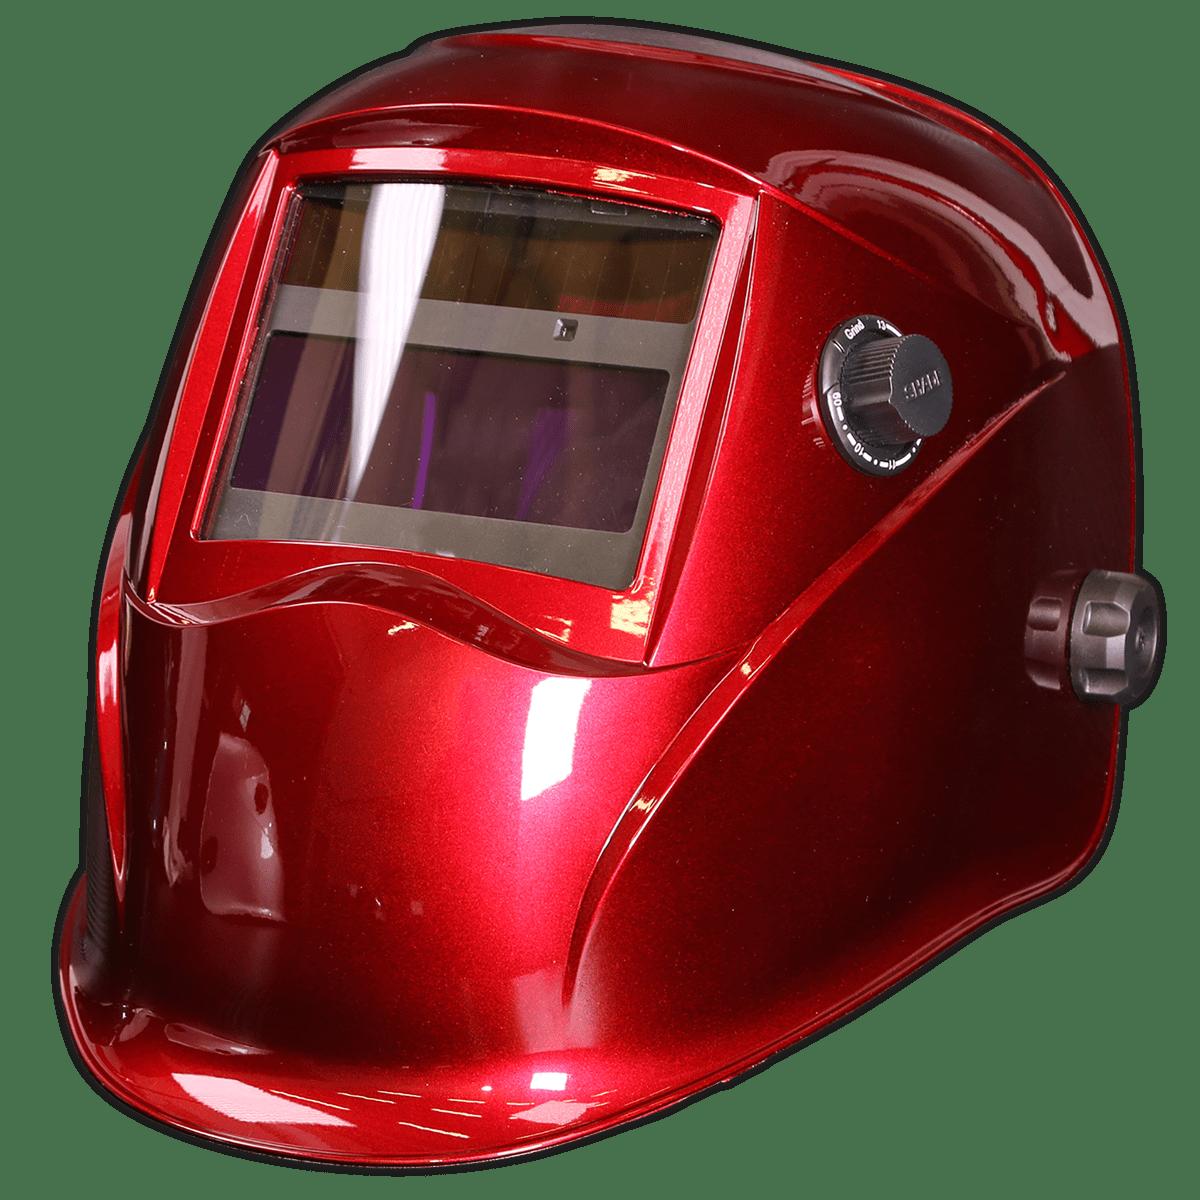 Sealey Welding Helmet Auto Darkening - Shade 9-13 - Red PWH612   Welding helmet with infinitely adjustable shade control between 9-13.   toolforce.ie